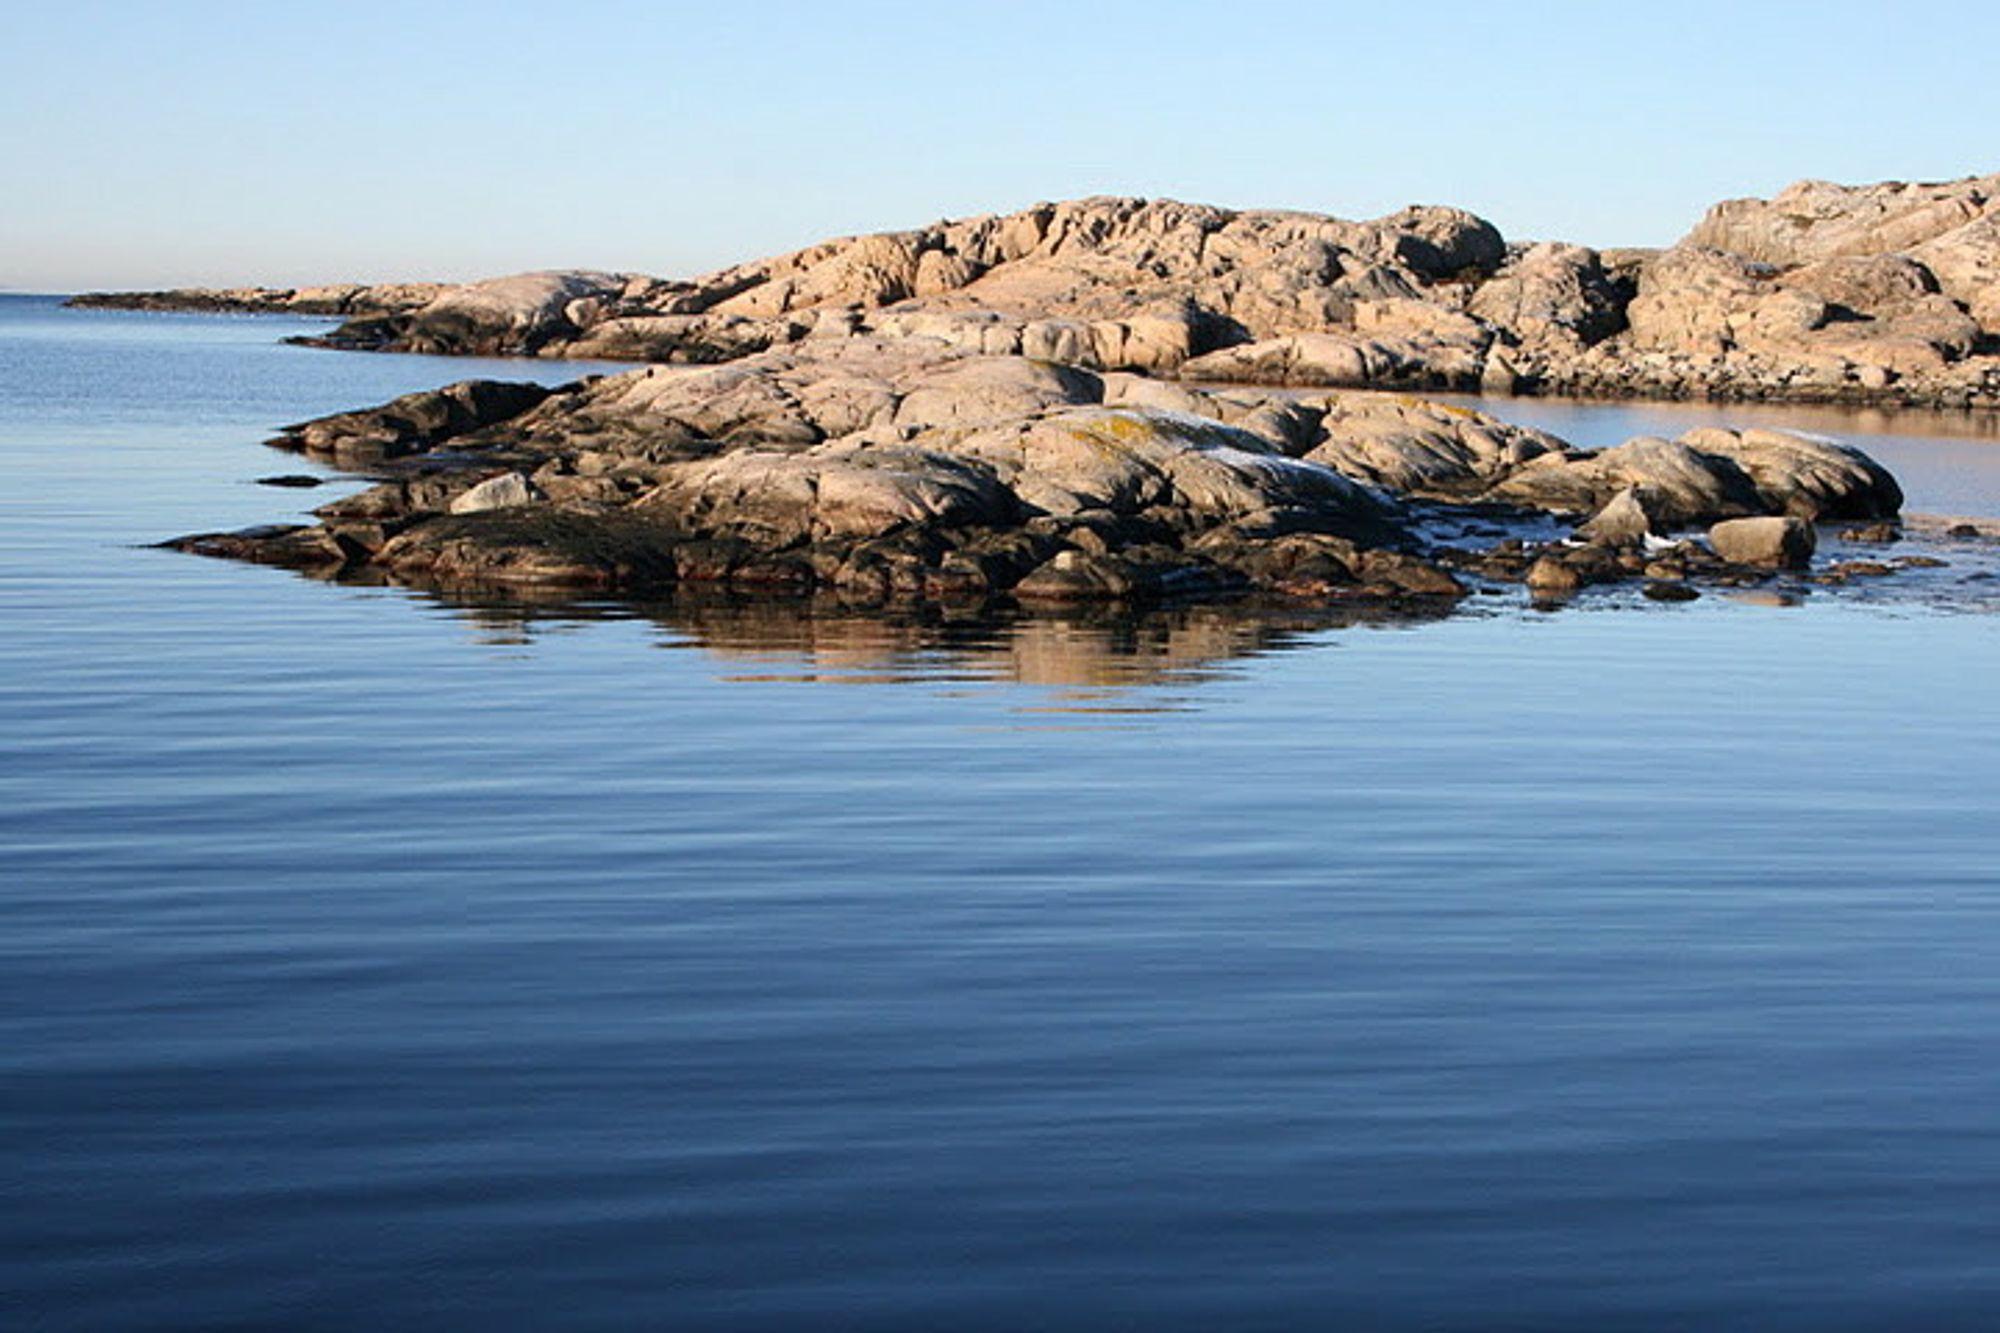 URØRT NATUR: Ytre Hvaler nasjonalpark er stort og relativt urørt naturområde med komplette økosystemer i sjøen og på land. Derfor bør det ikke bygges høyspentkabel der, mener parkens styre.